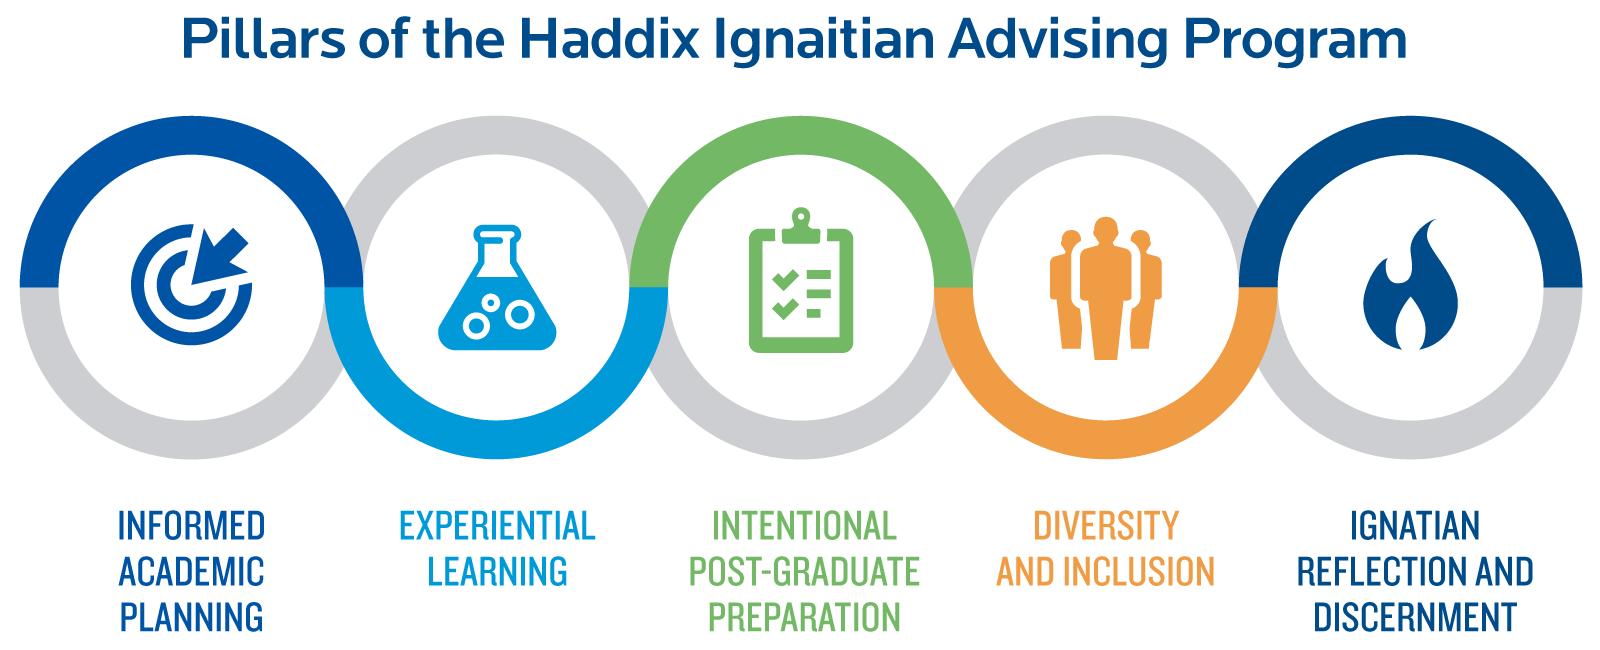 Pillars of the Haddix Ignaitian Advising Program